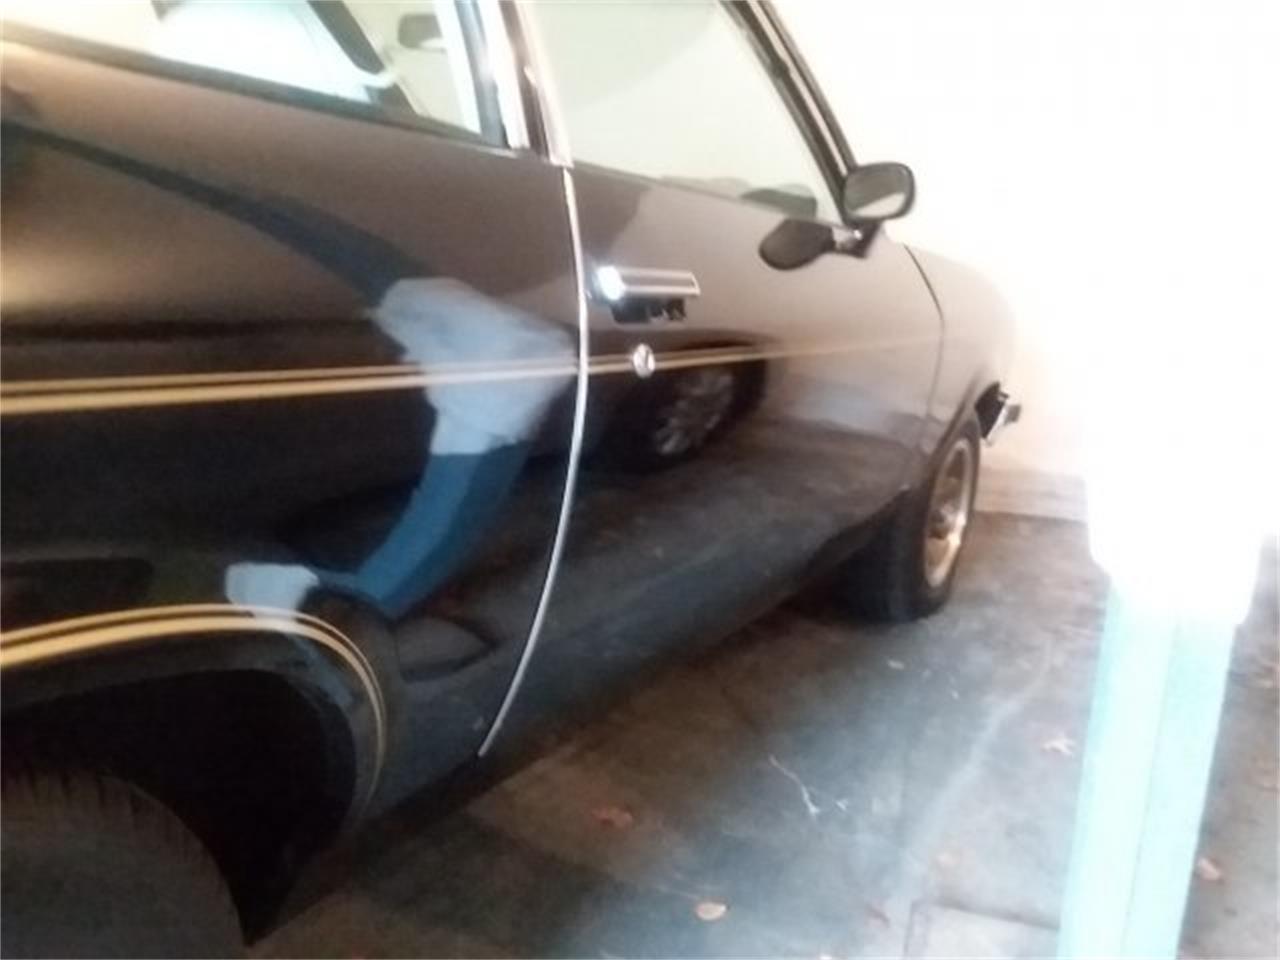 Large Picture of '76 Chevrolet Vega located in Hanover Massachusetts - $23,900.00 - PYE8